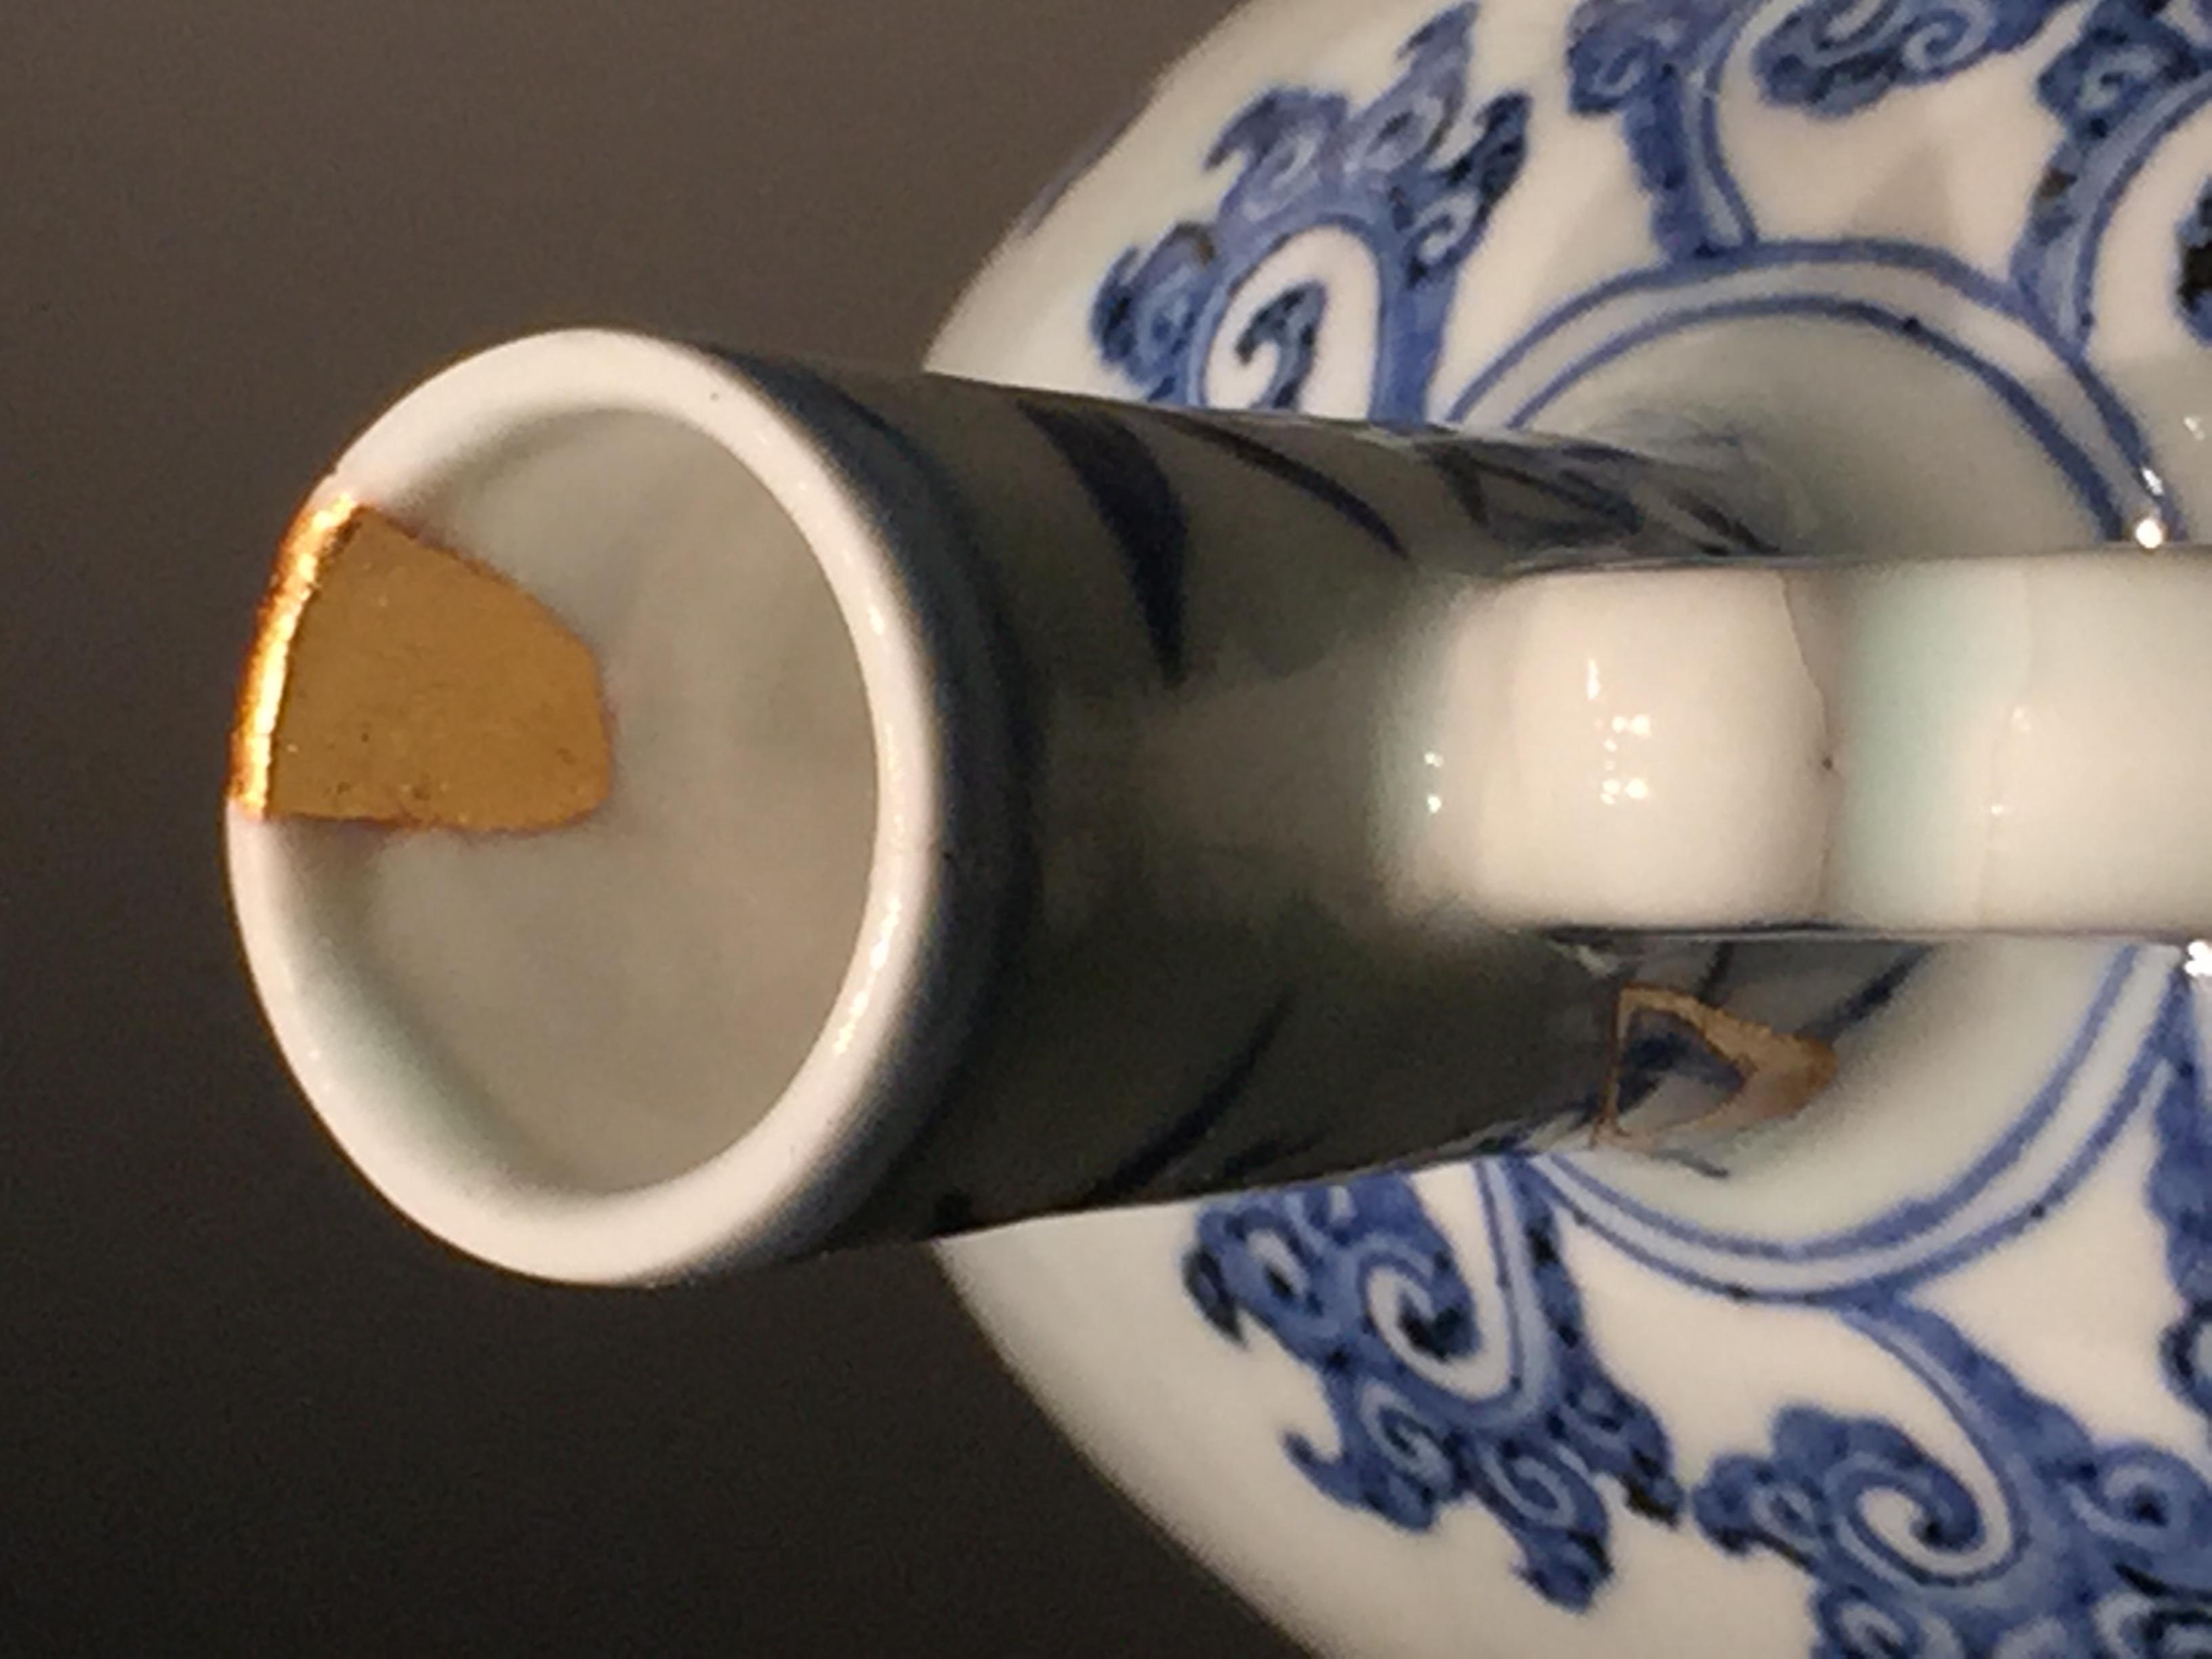 Chinese-Porcelain-British-Museum-Percival-David-jessewaugh.com-55.jpg